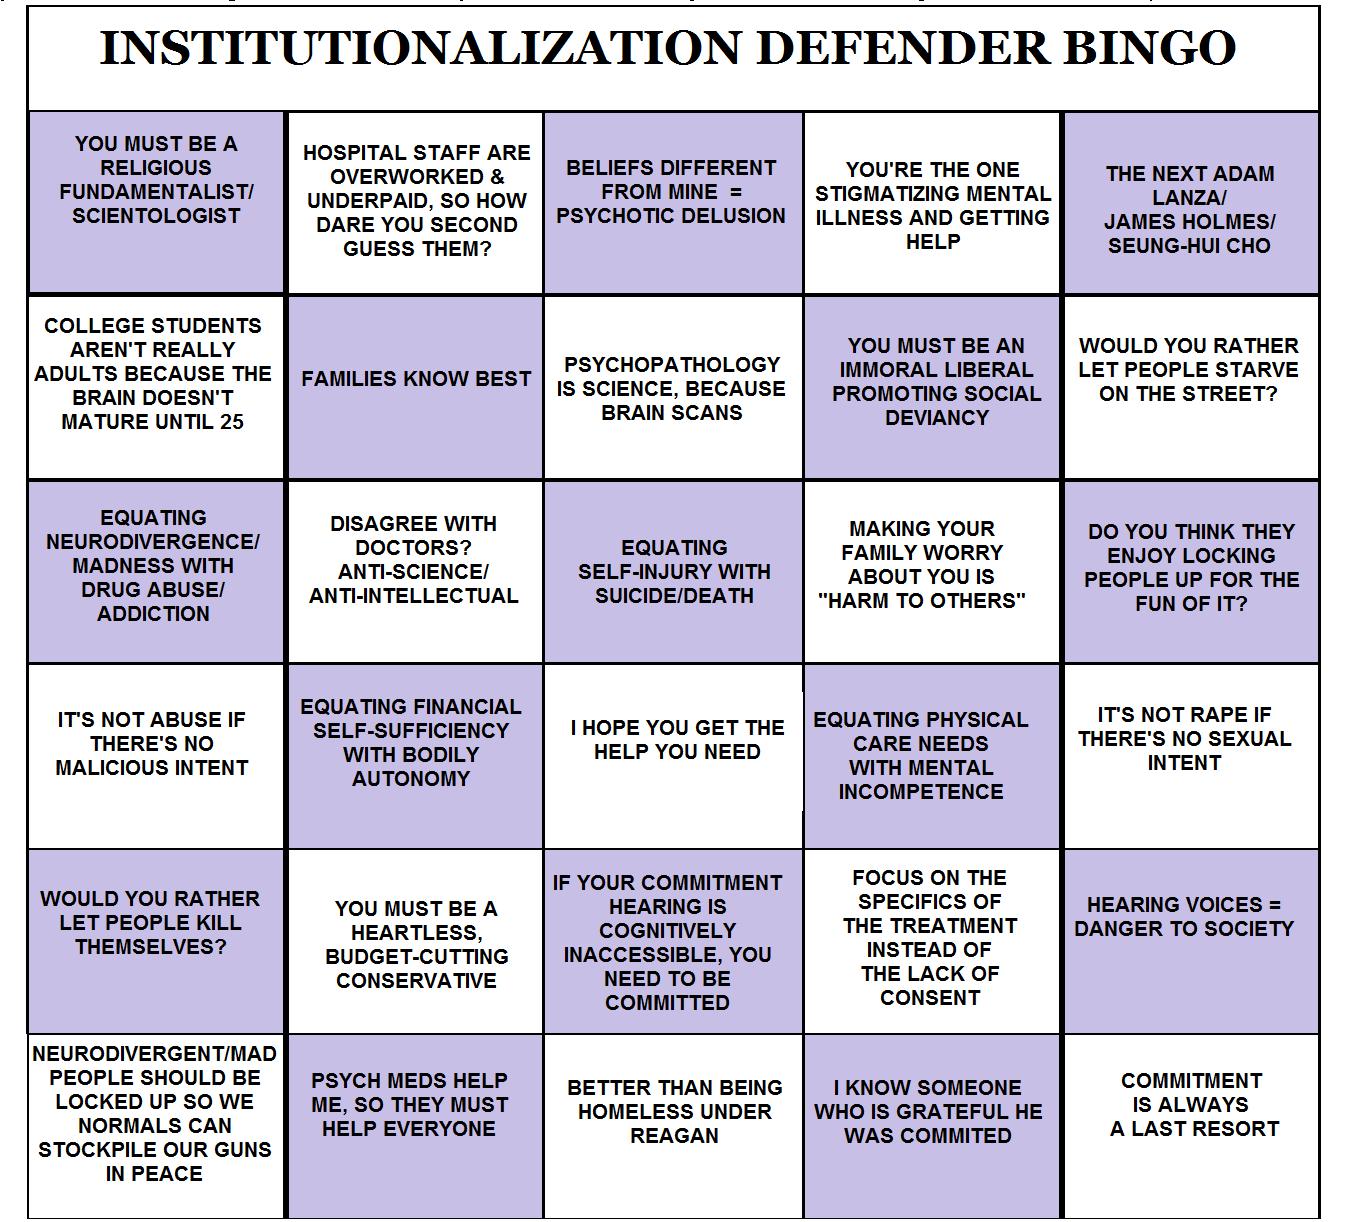 Institutionalization Defender Bingo